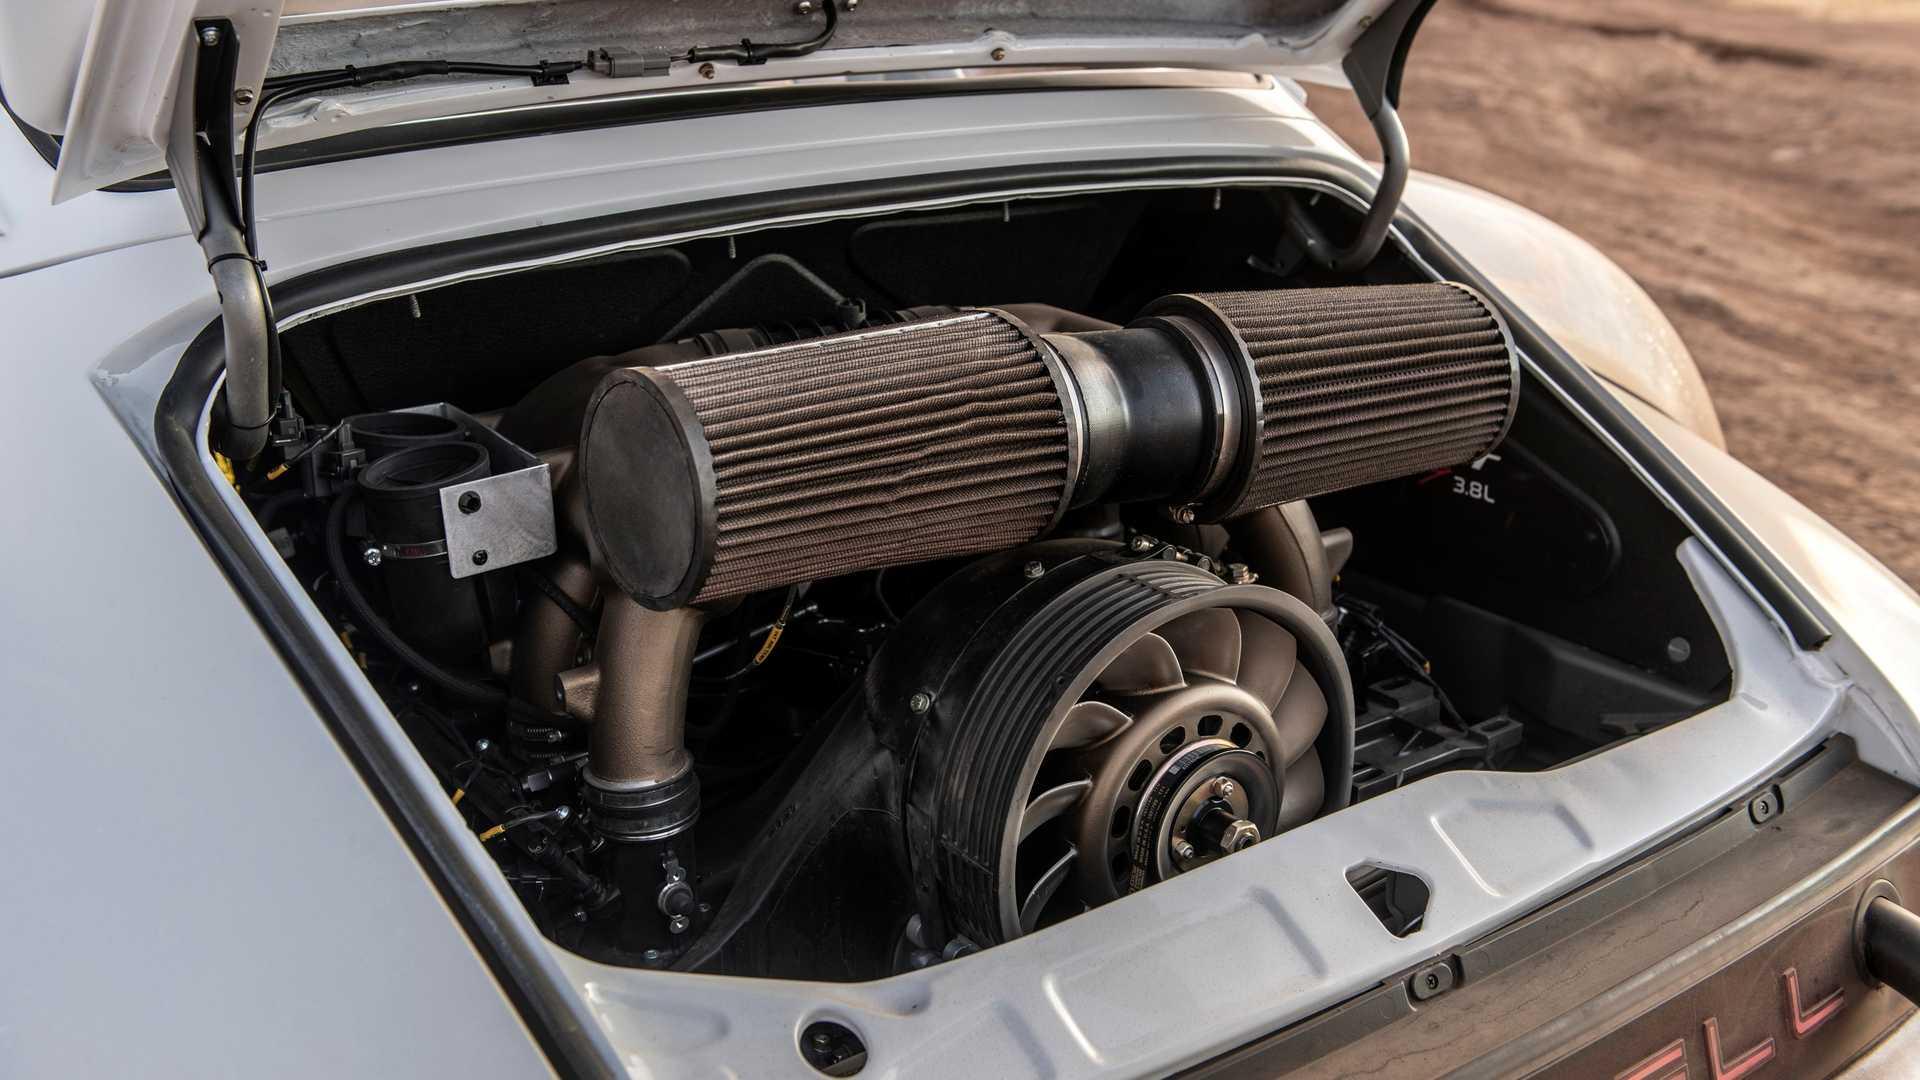 russell-built-fabrications-911-baja-13